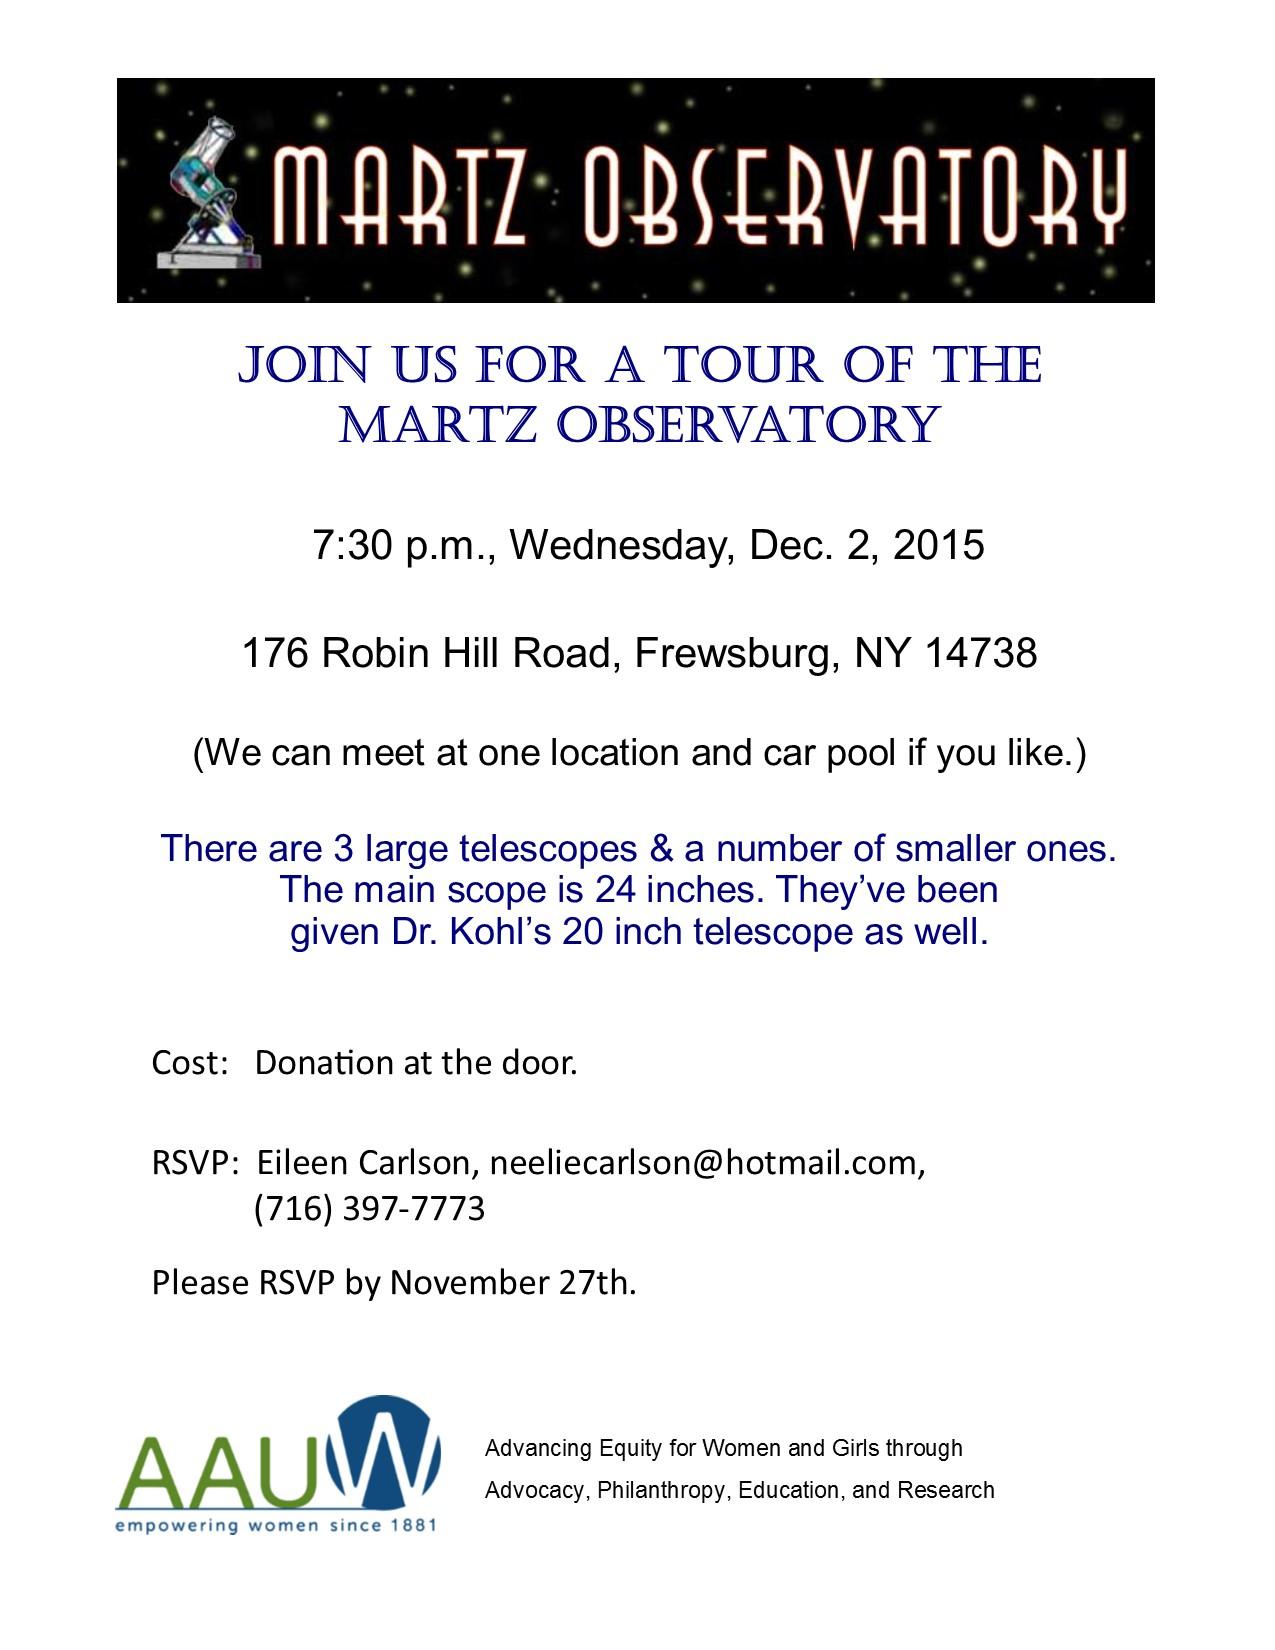 Martz Observatory